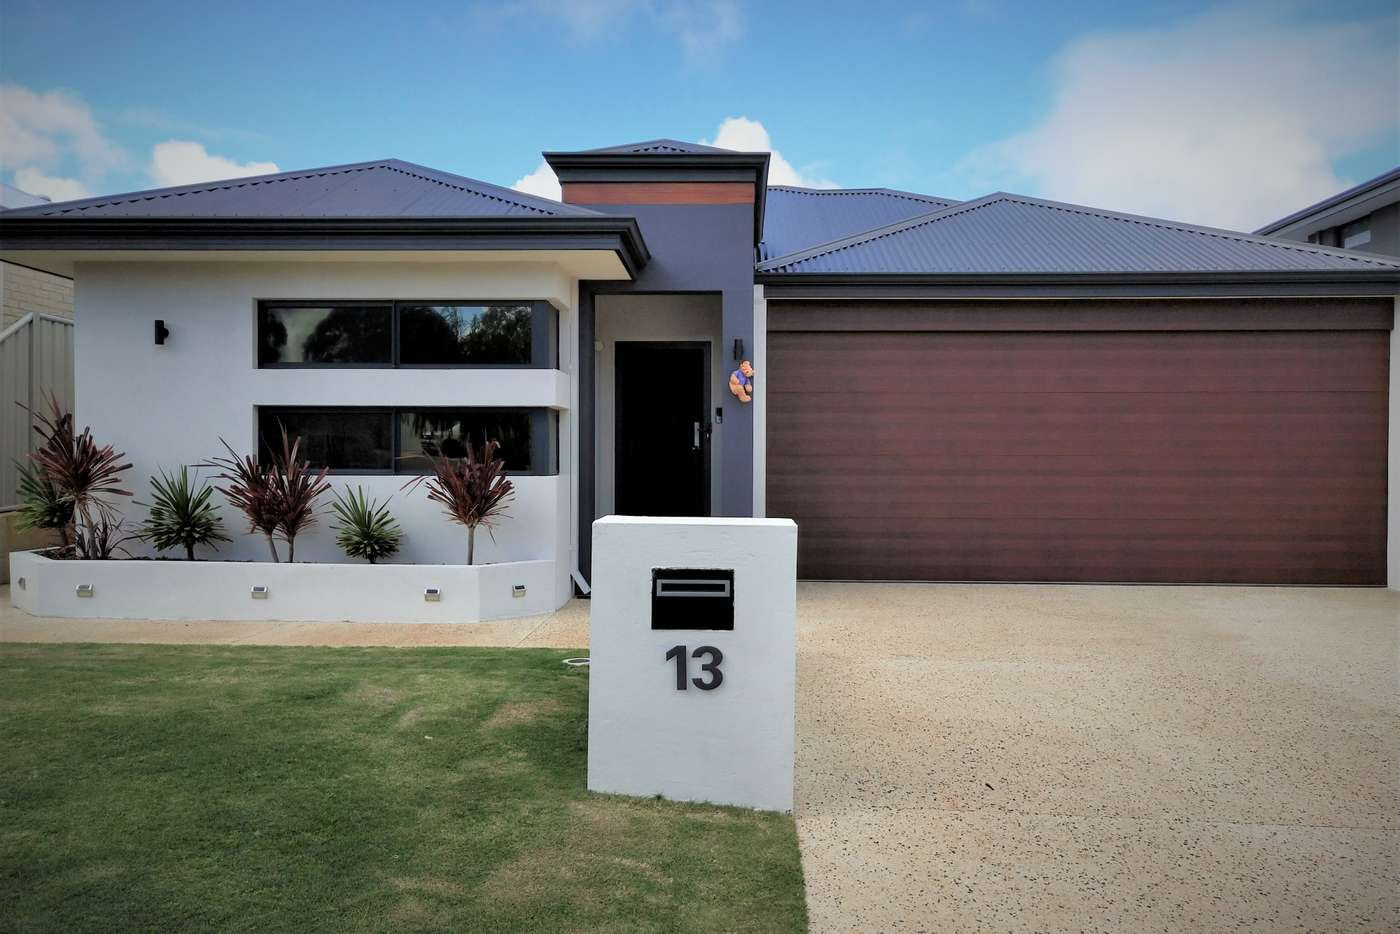 Main view of Homely house listing, 13 Flourish Way, Craigie WA 6025